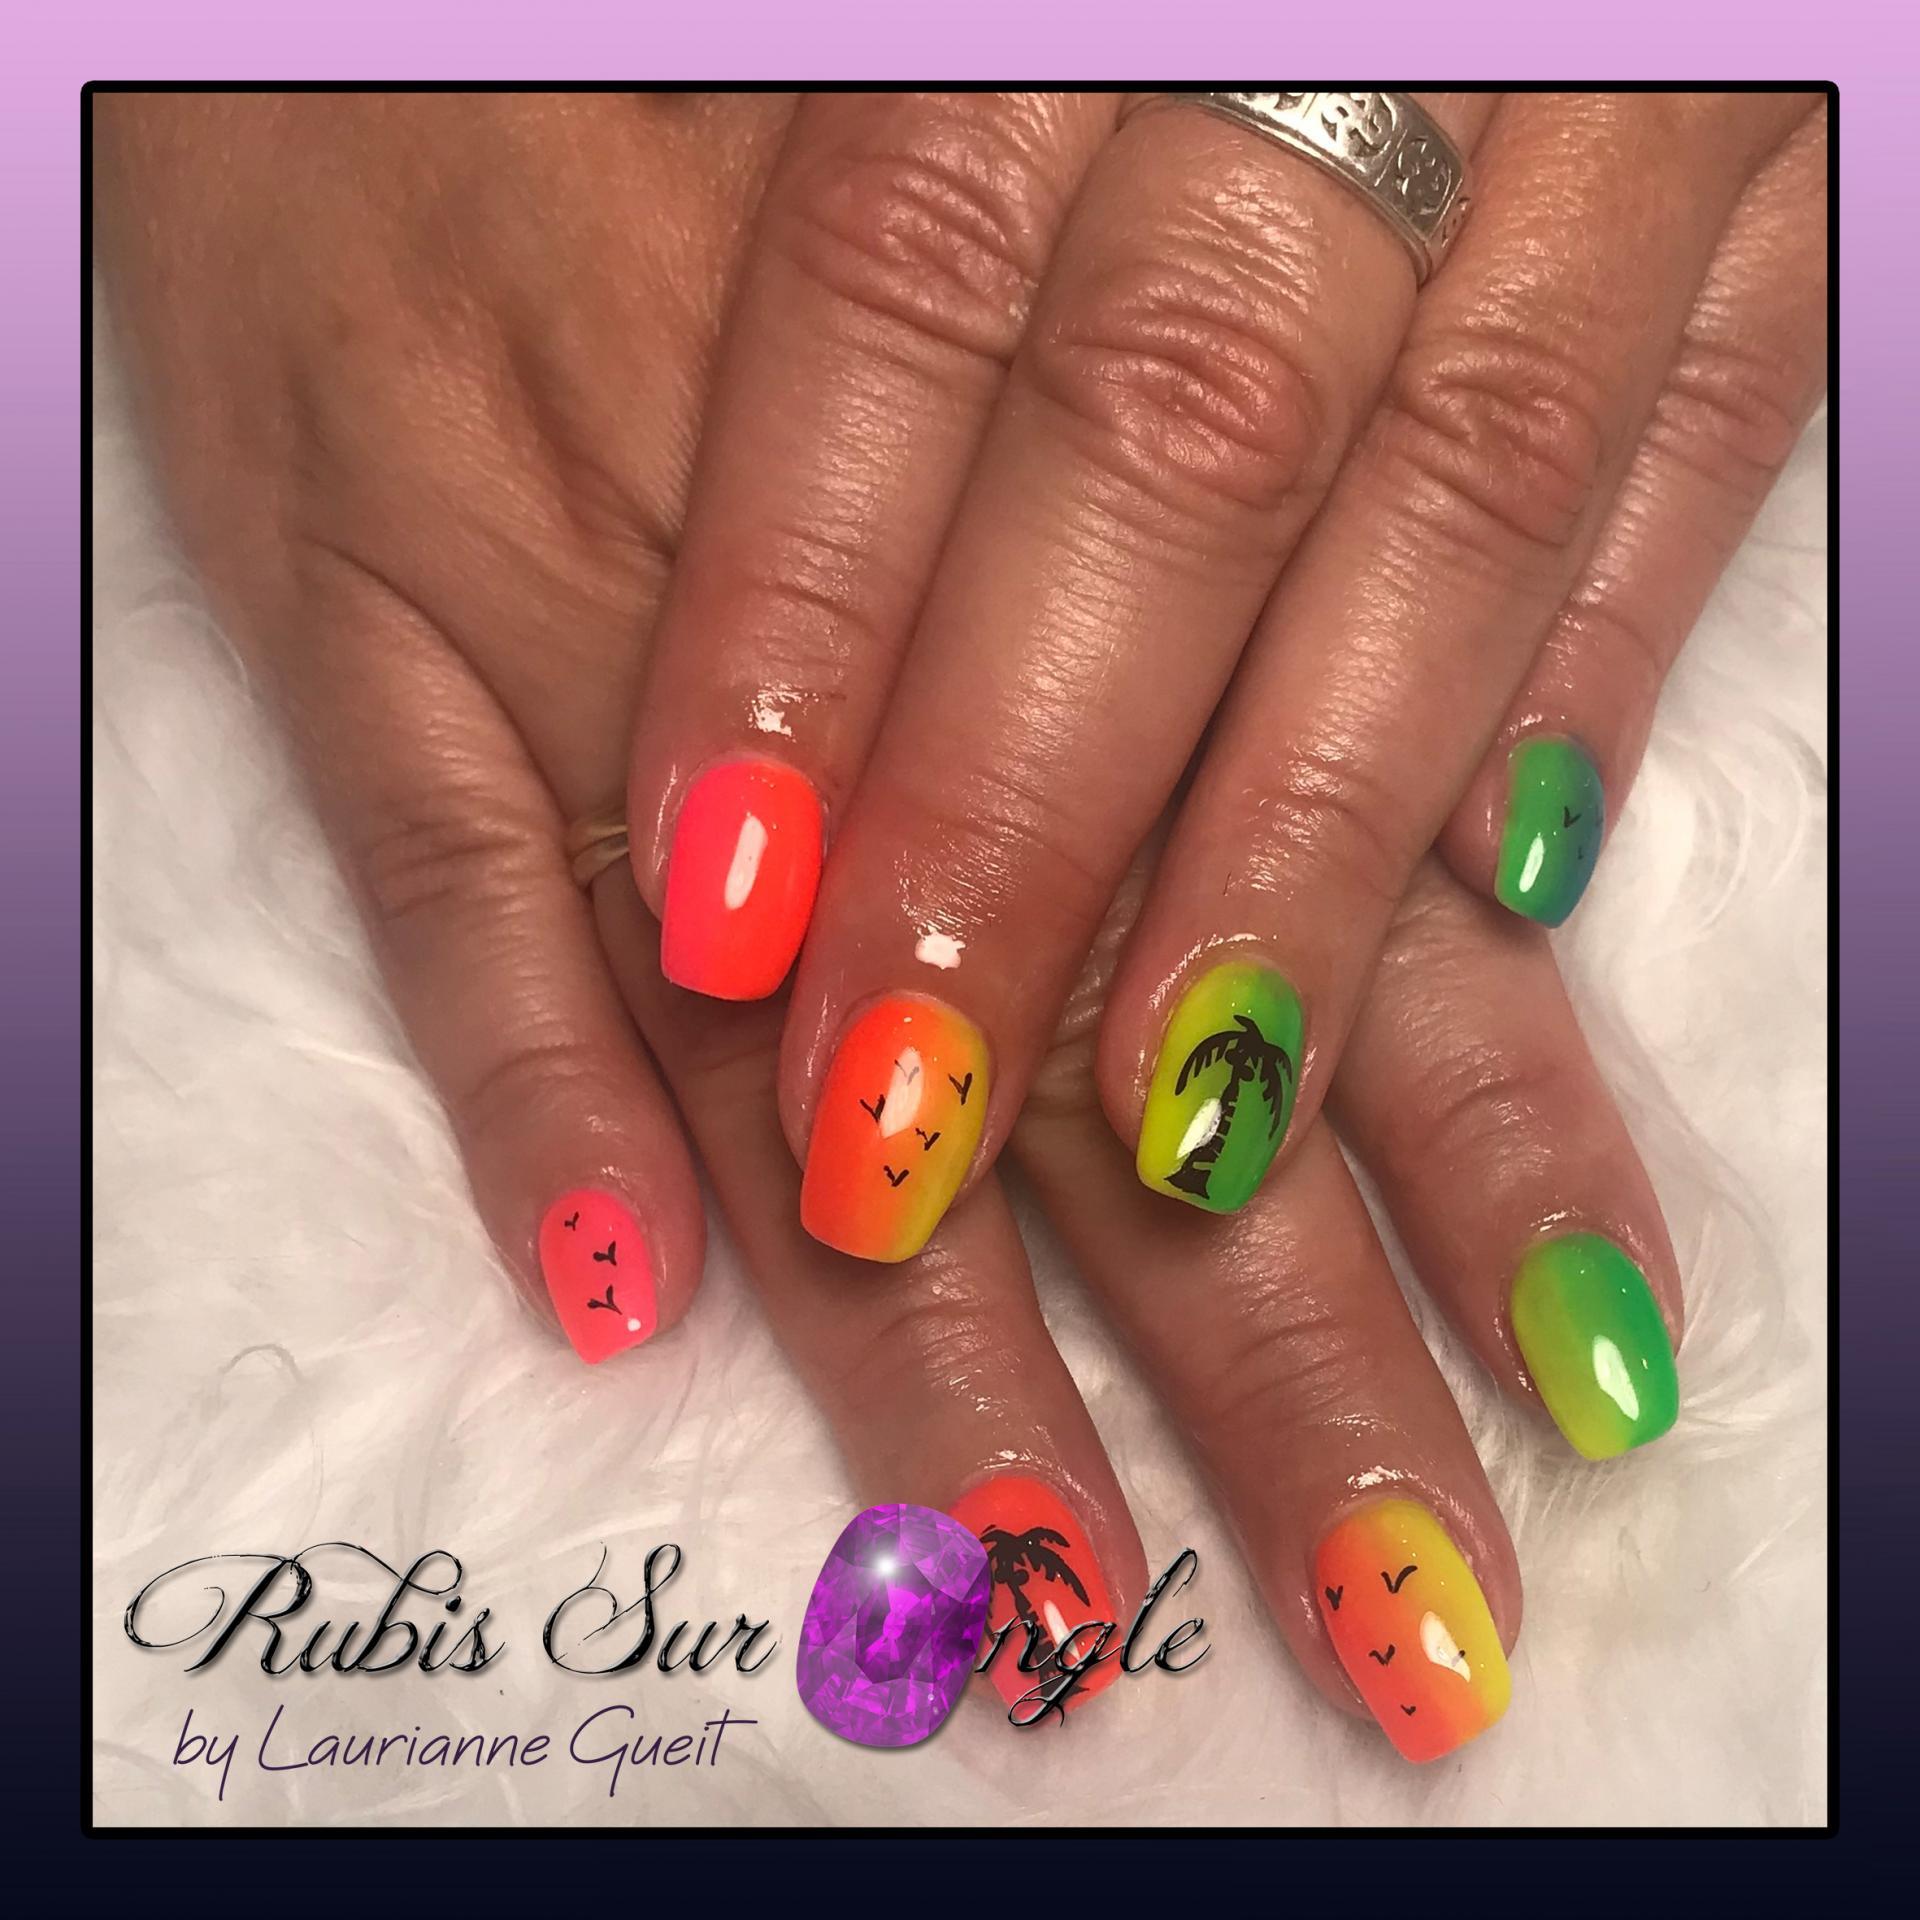 Rubis-Sur-Ongle-Nail-Art-Degrade-Palmier